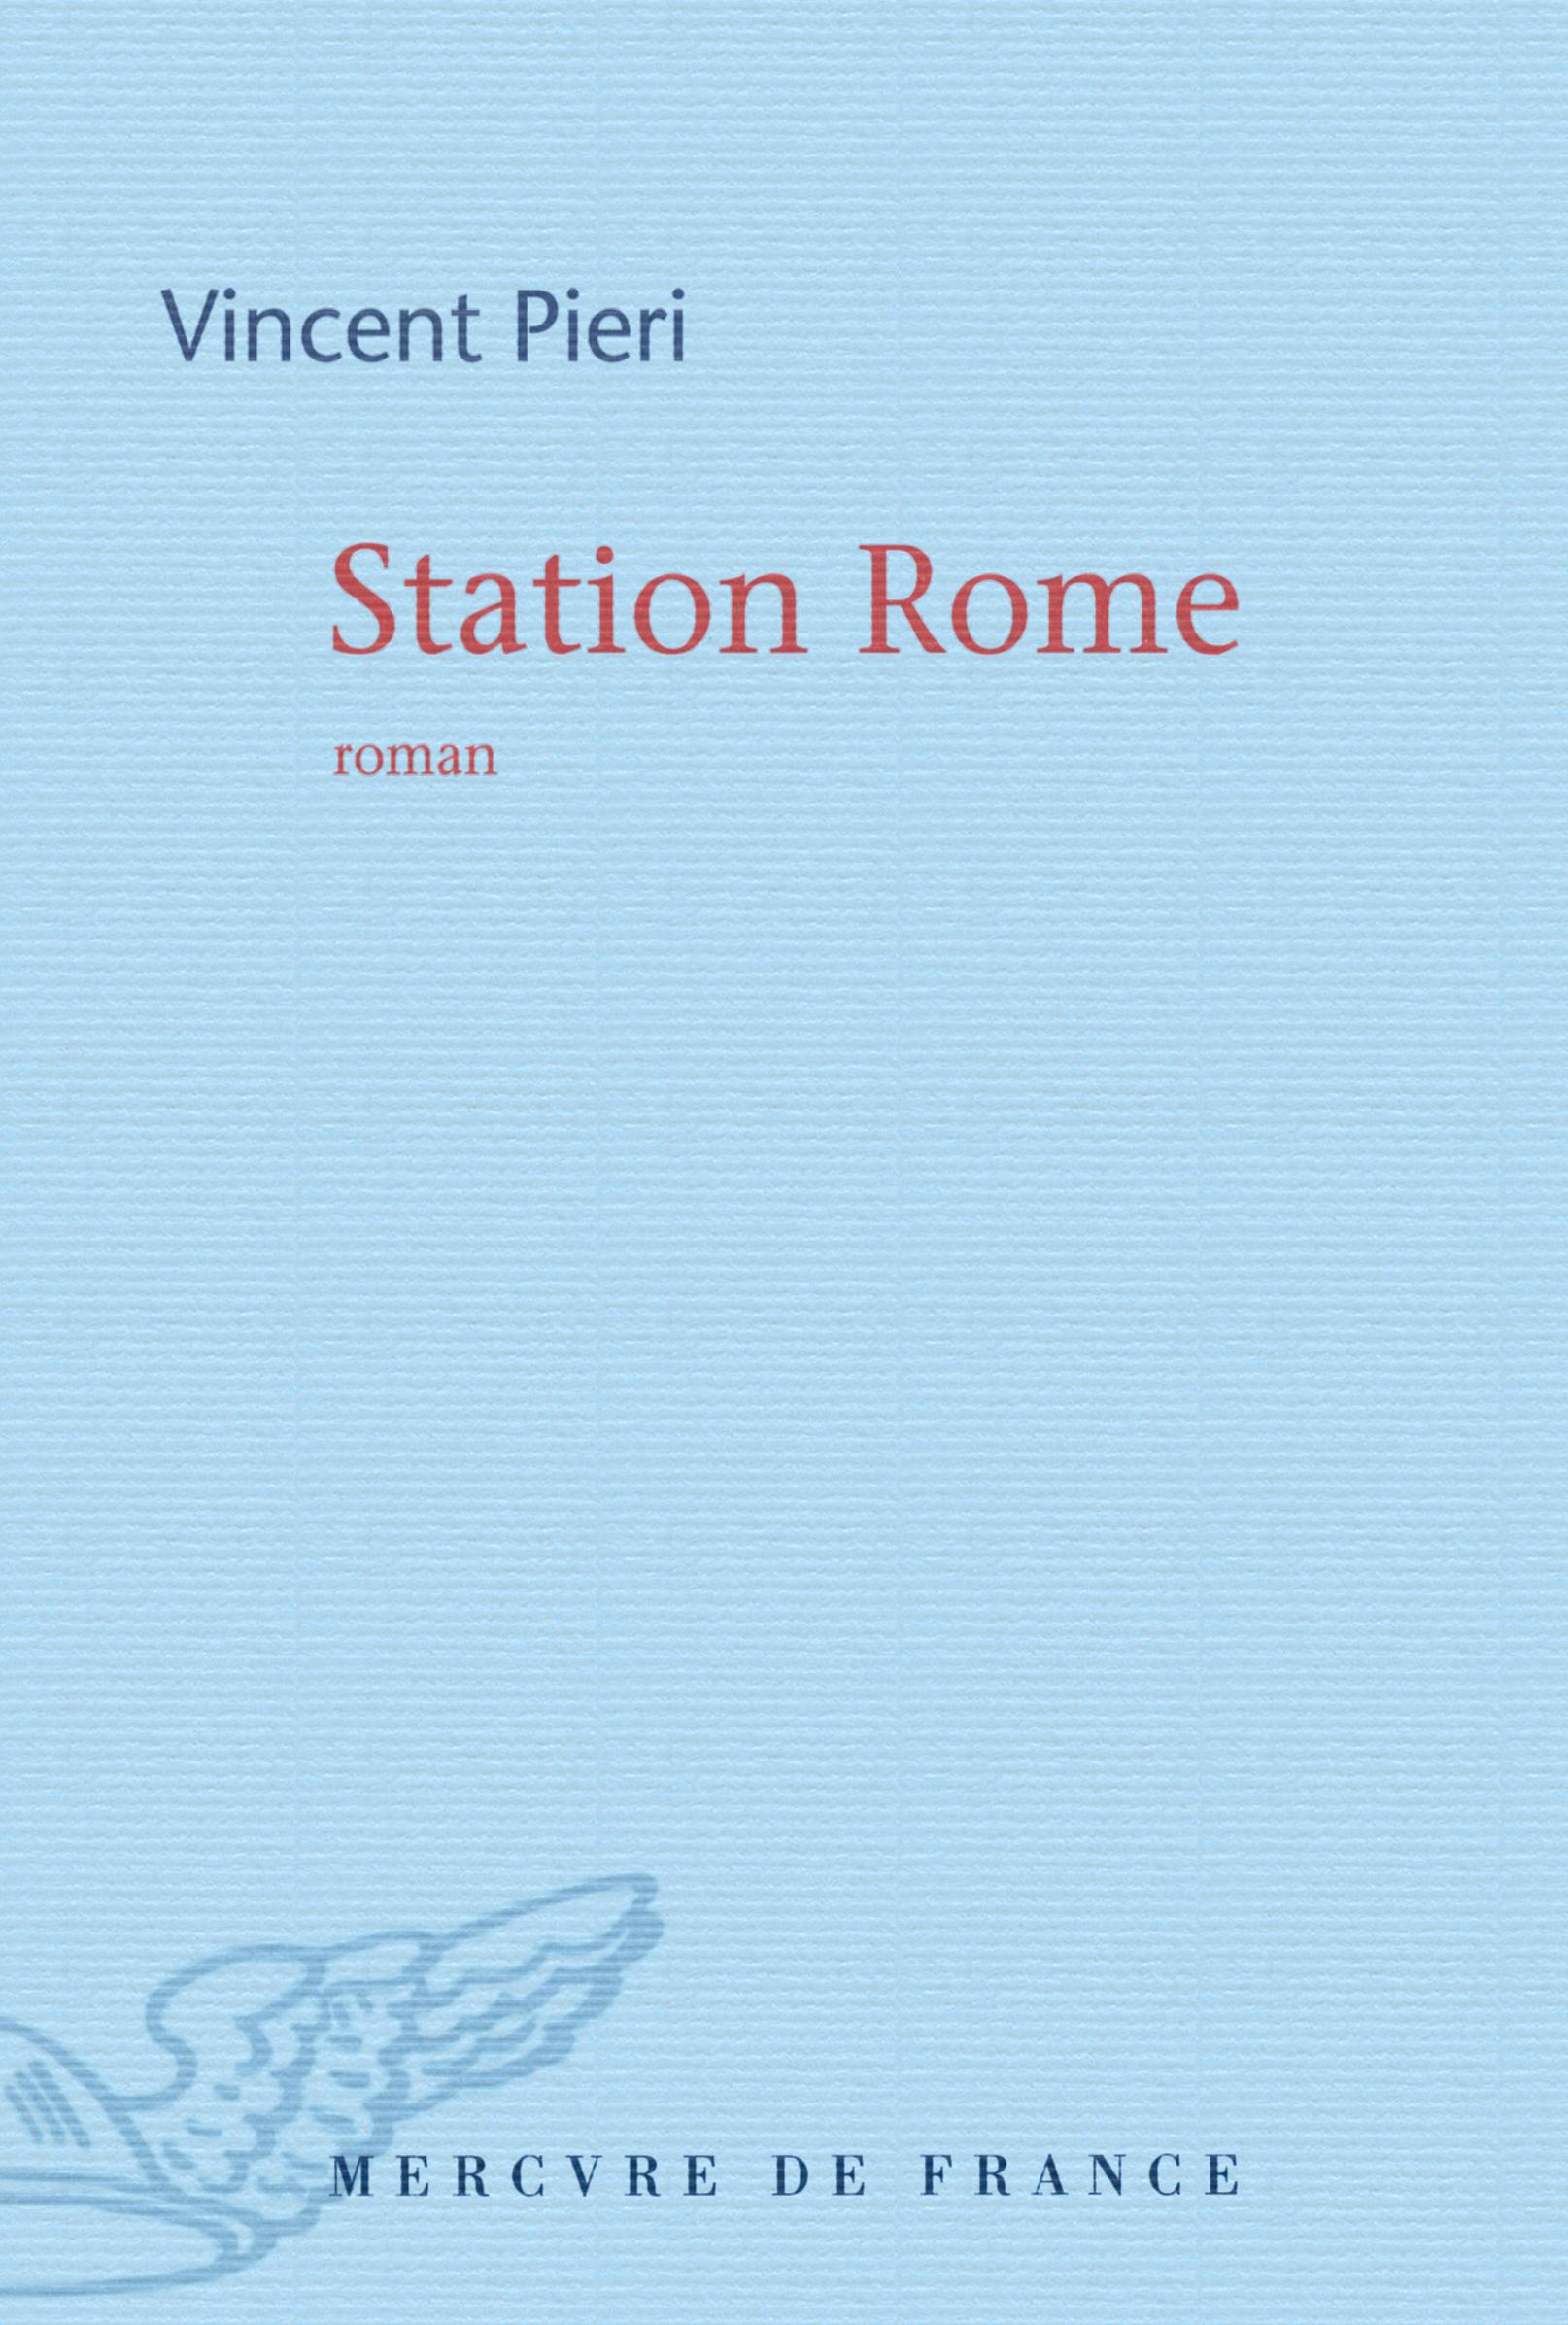 Station Rome